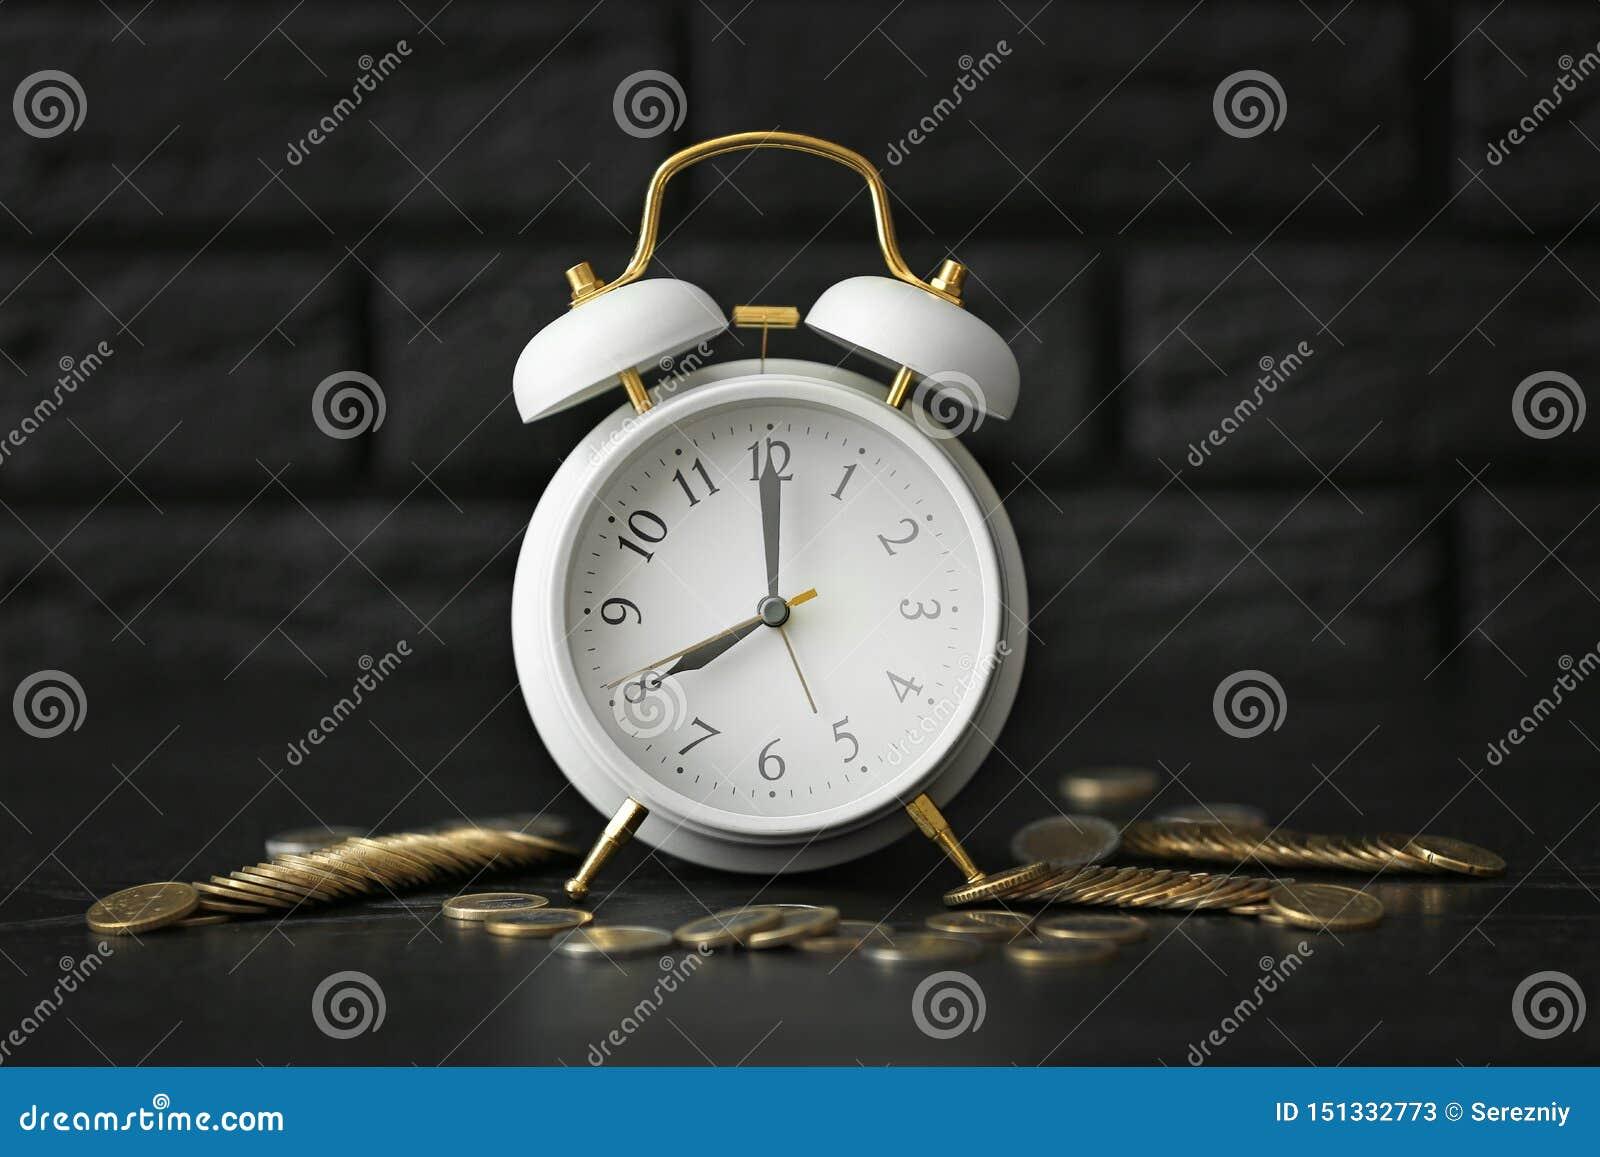 Alarm clock with coins on dark table